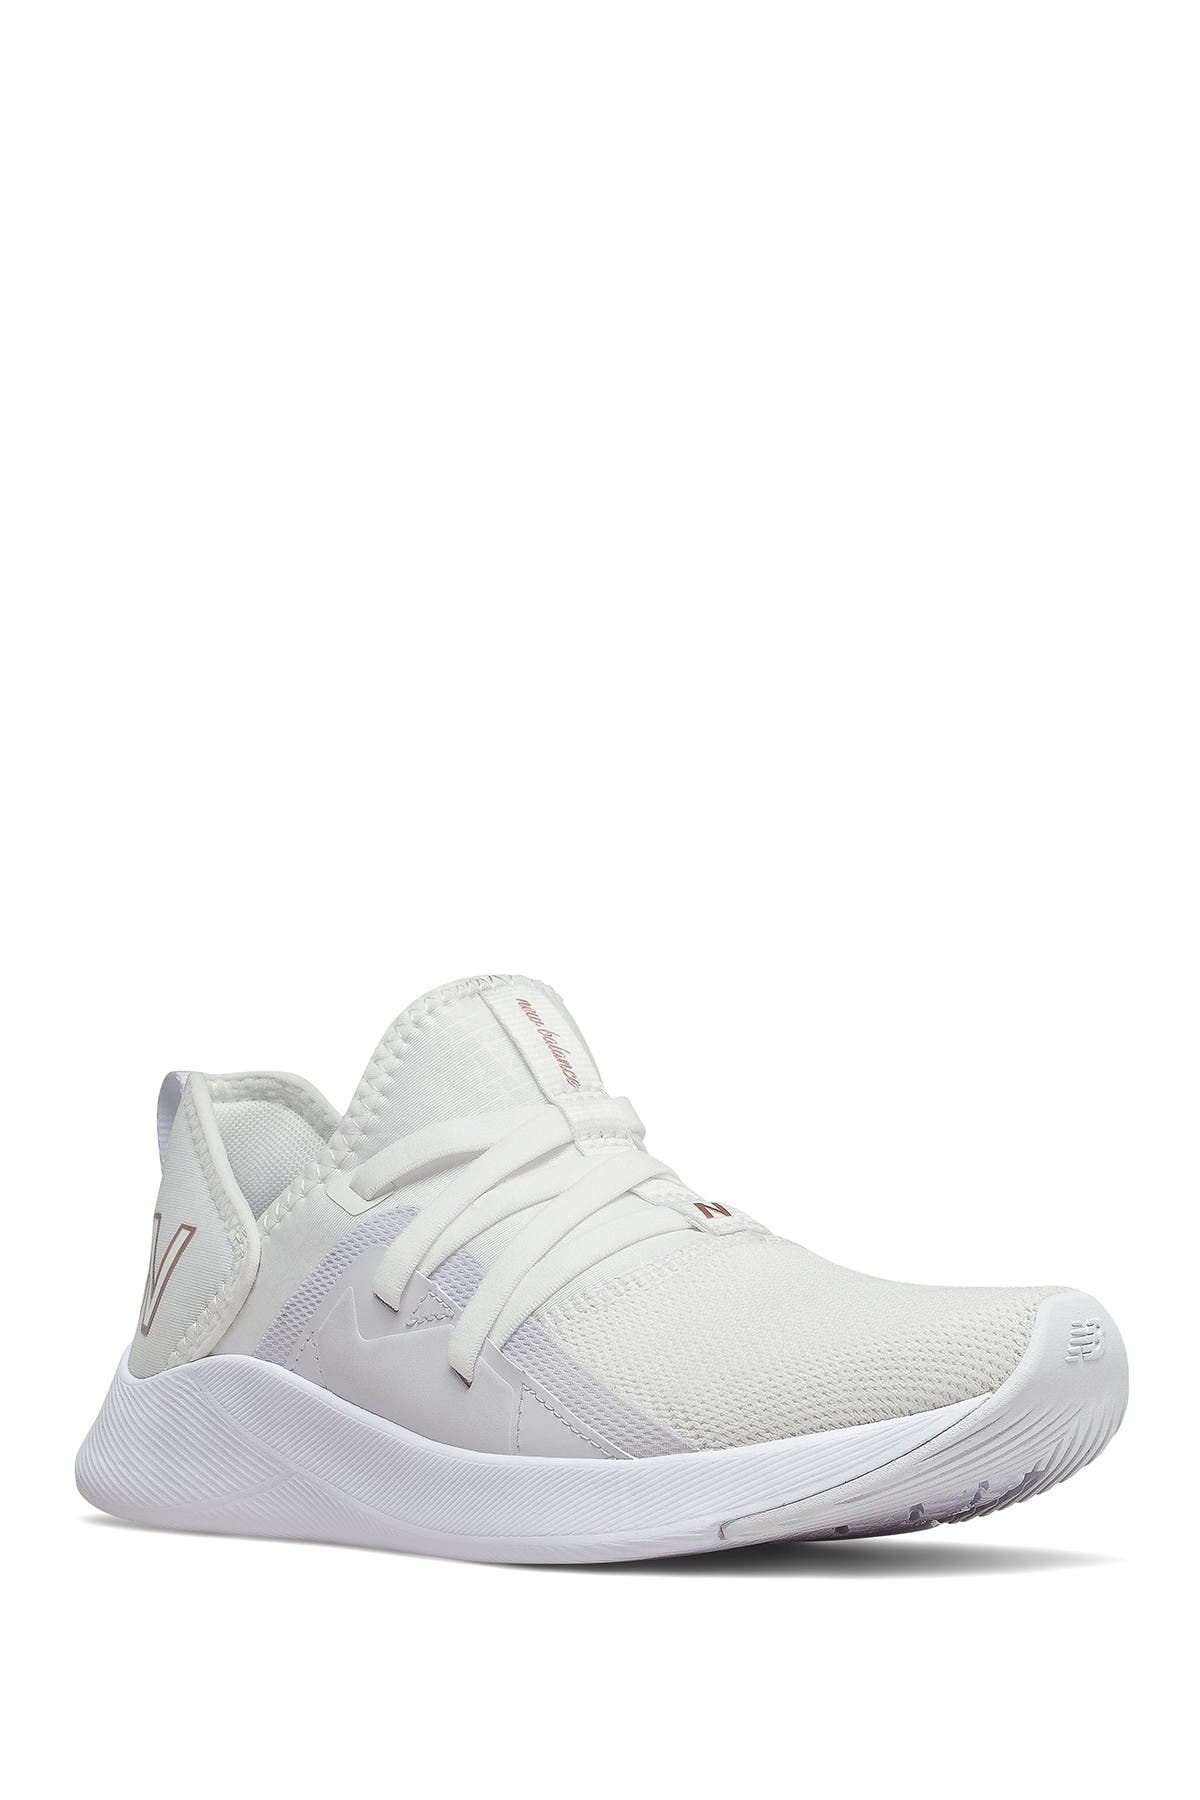 New Balance Sneakers BEAYA SLIP-ON TRAINING SNEAKER